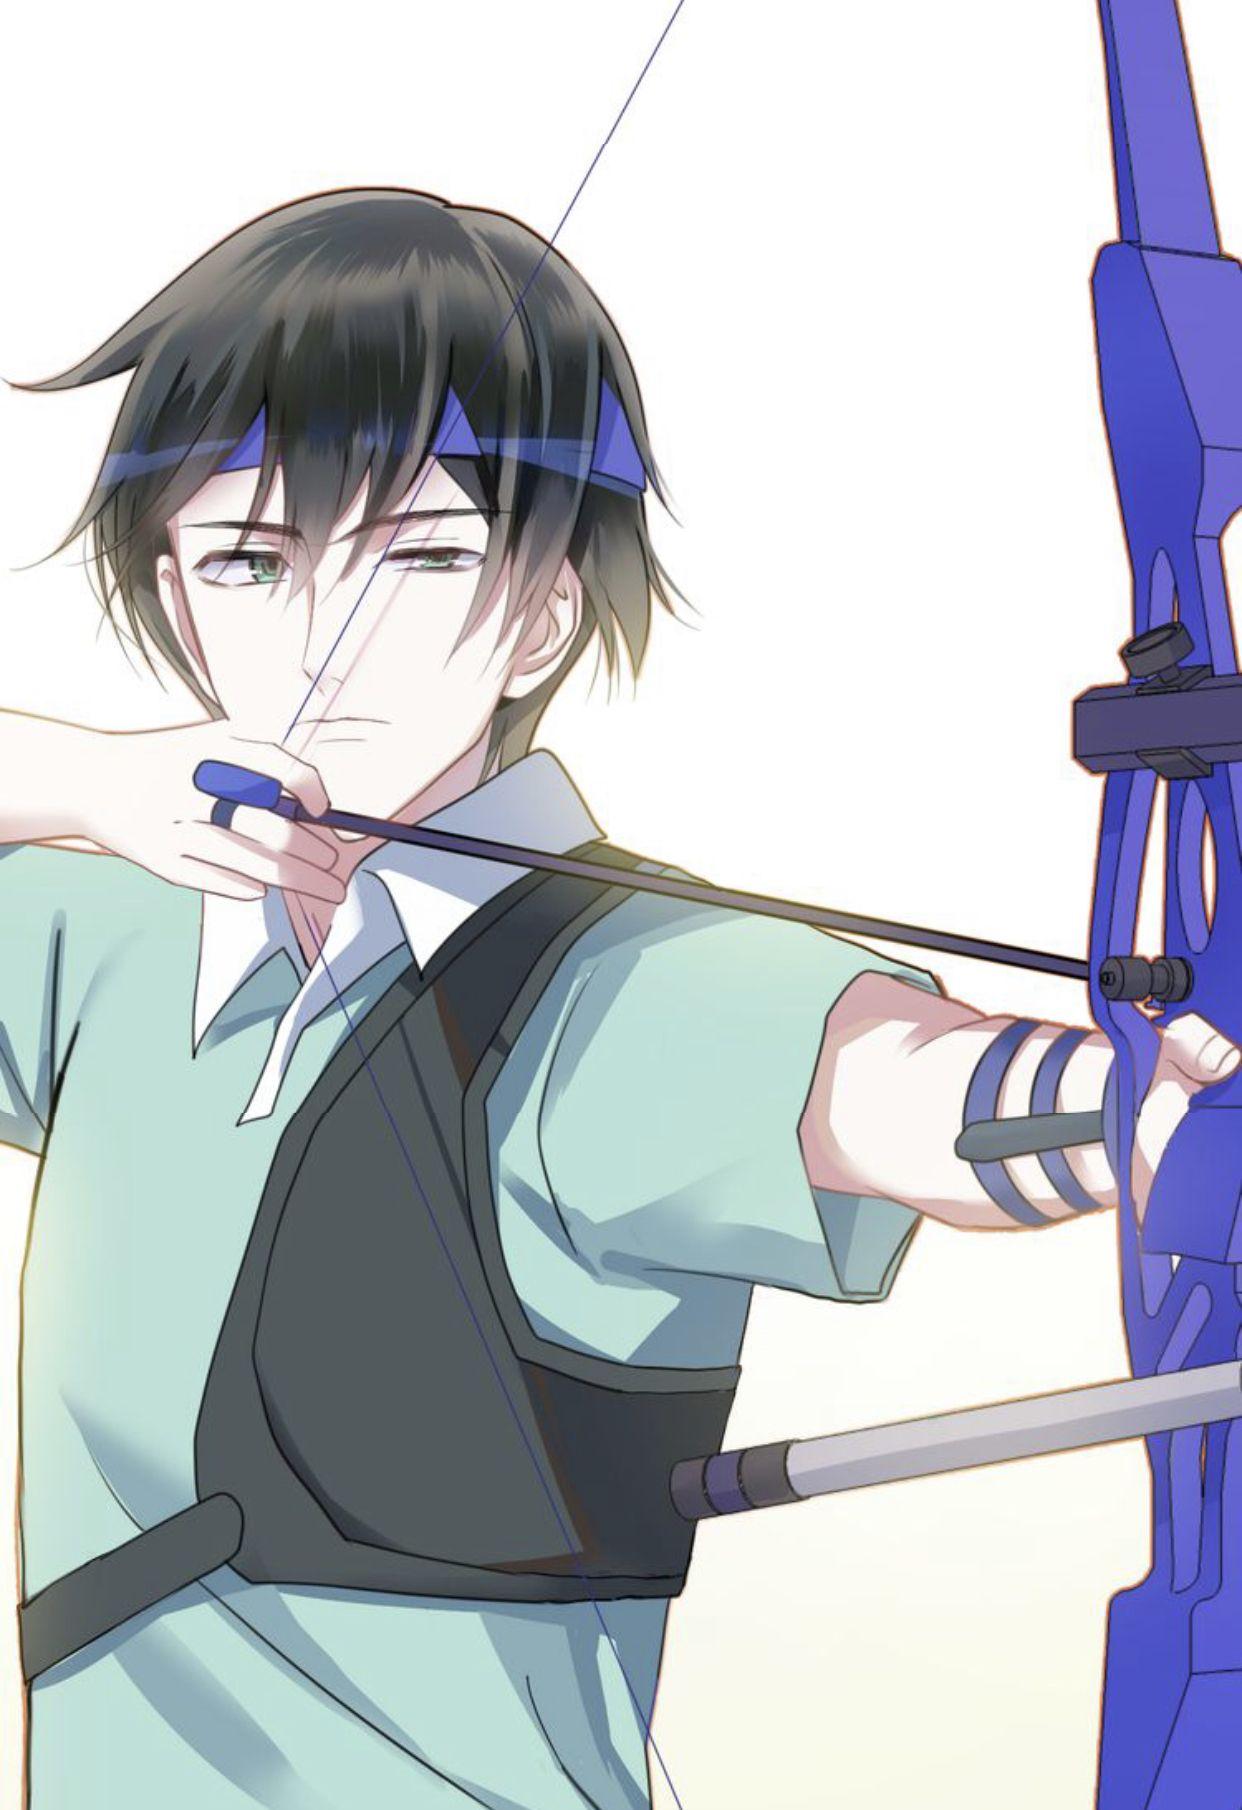 Pin by Animemangaluver on Zero Point Idol Manga Anime